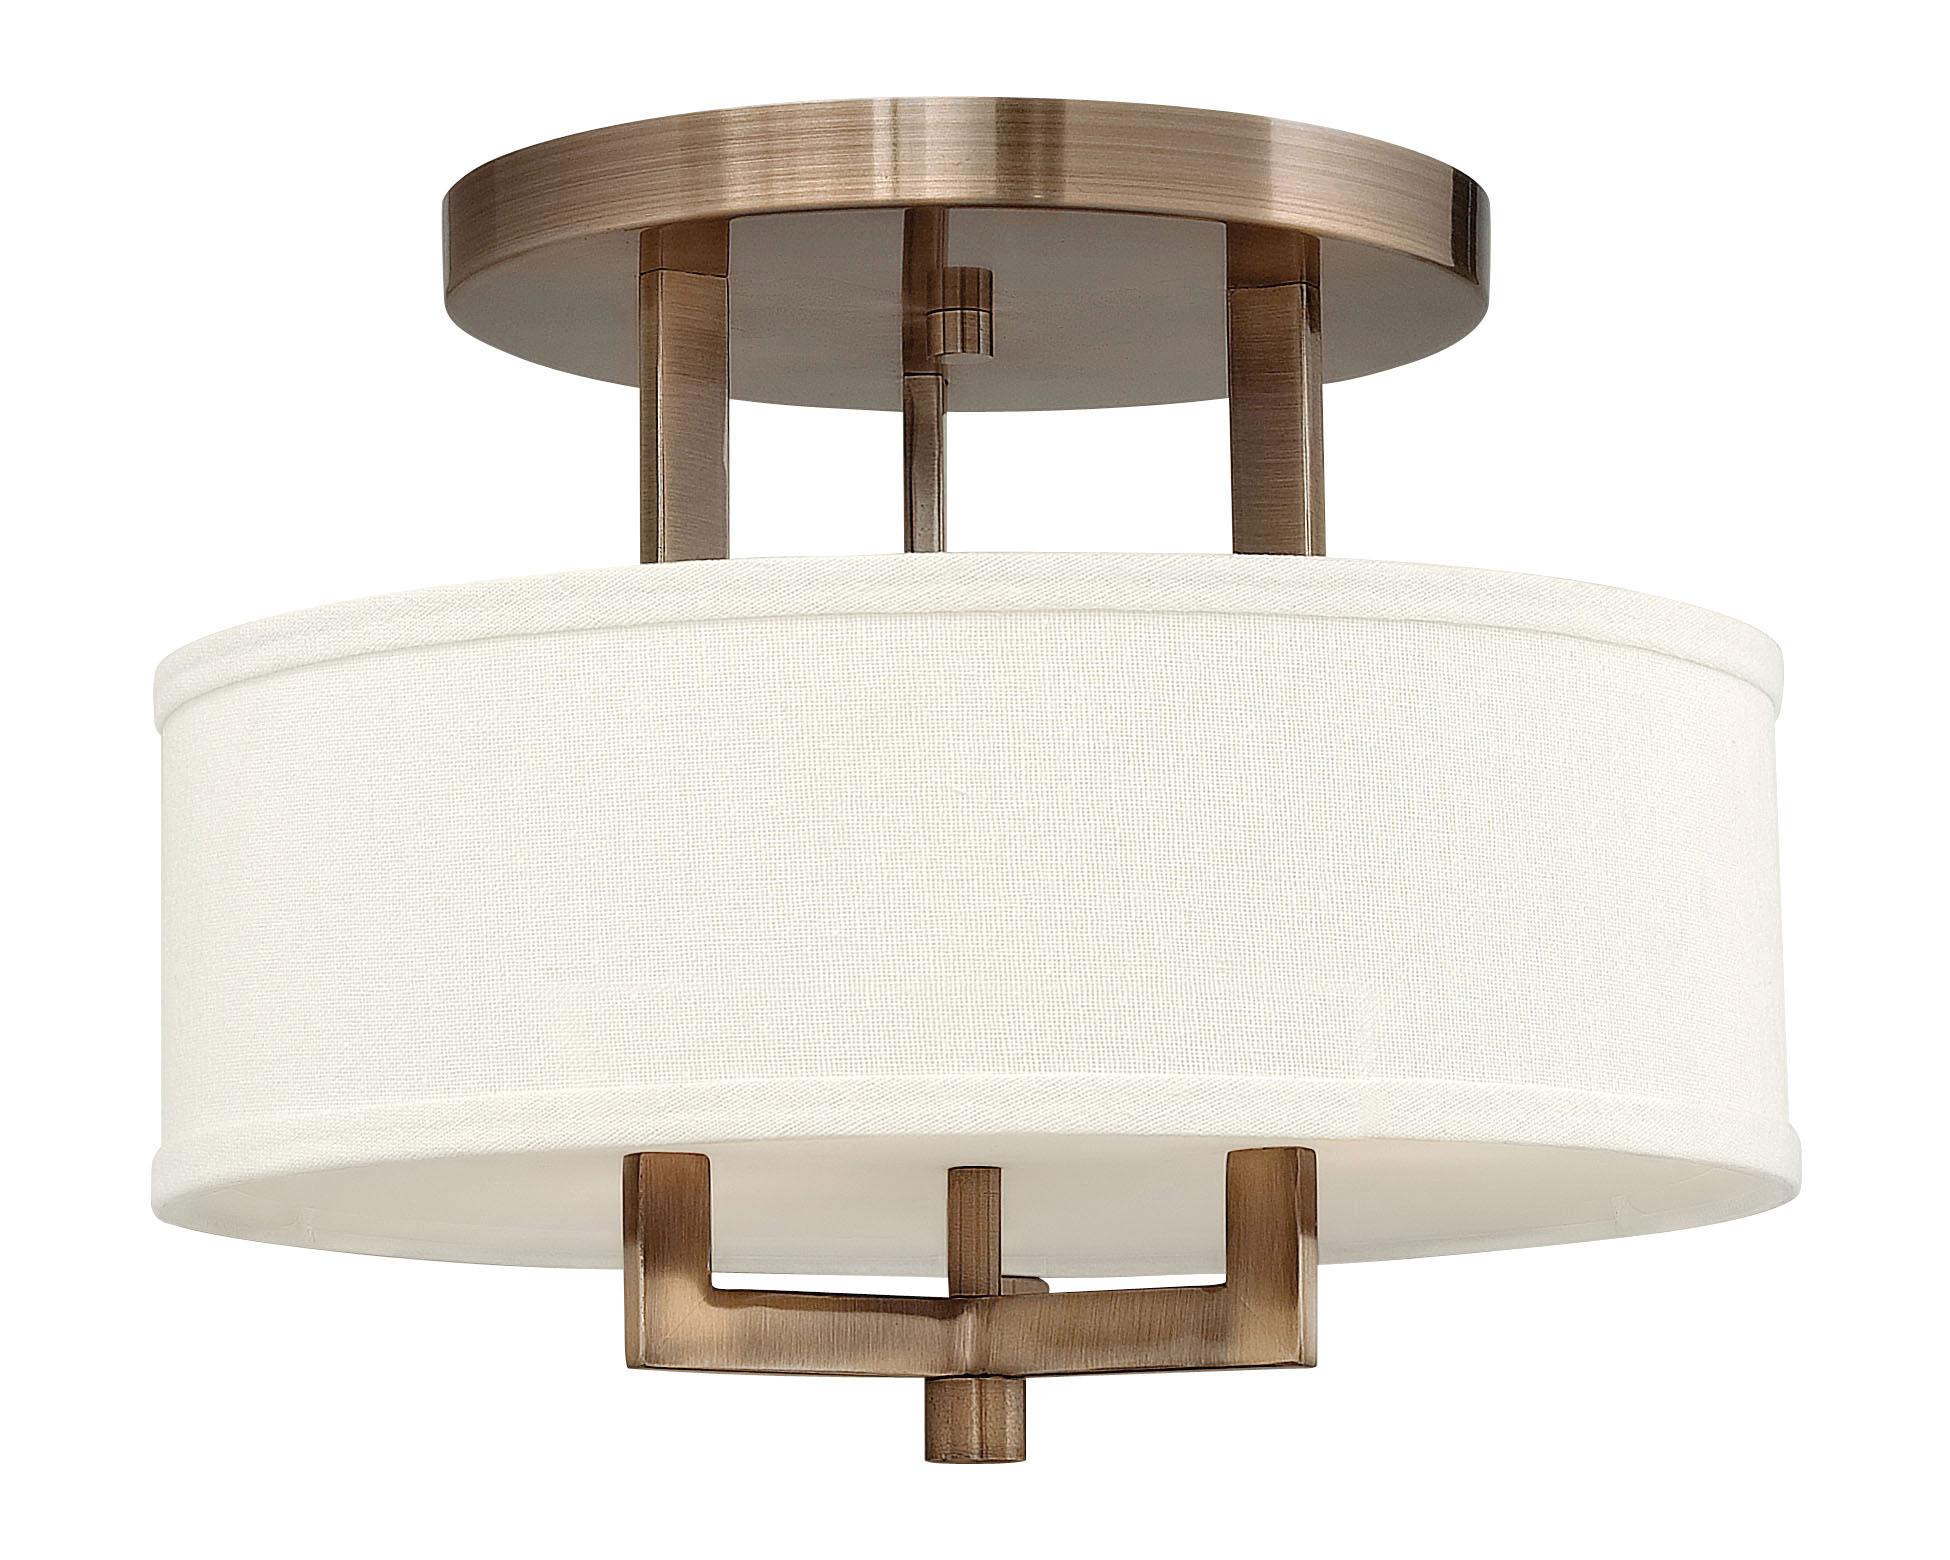 com y dp modern fixture bedroom simple amazon chandelier ceiling flush for living chandeliers style elegant chrome l dining mount light room